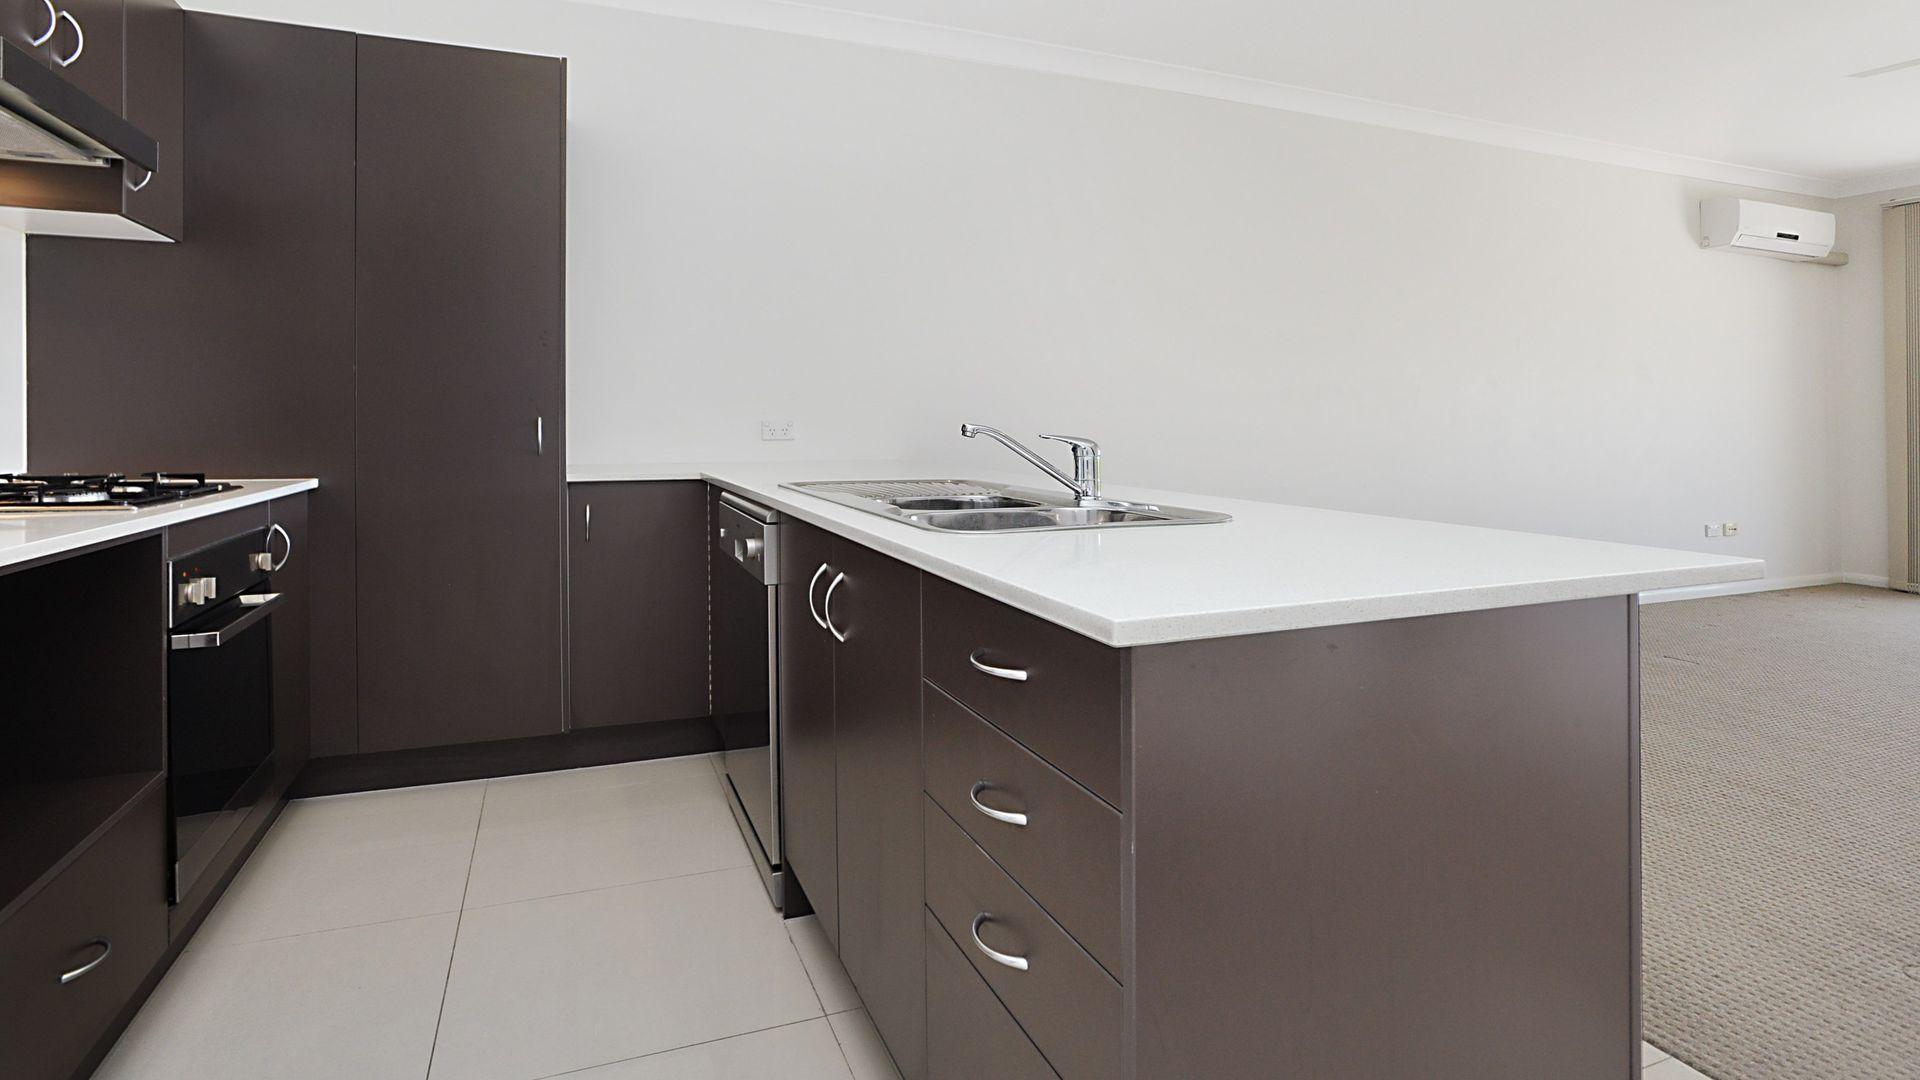 42/24 Westacott Street, Nundah QLD 4012, Image 1